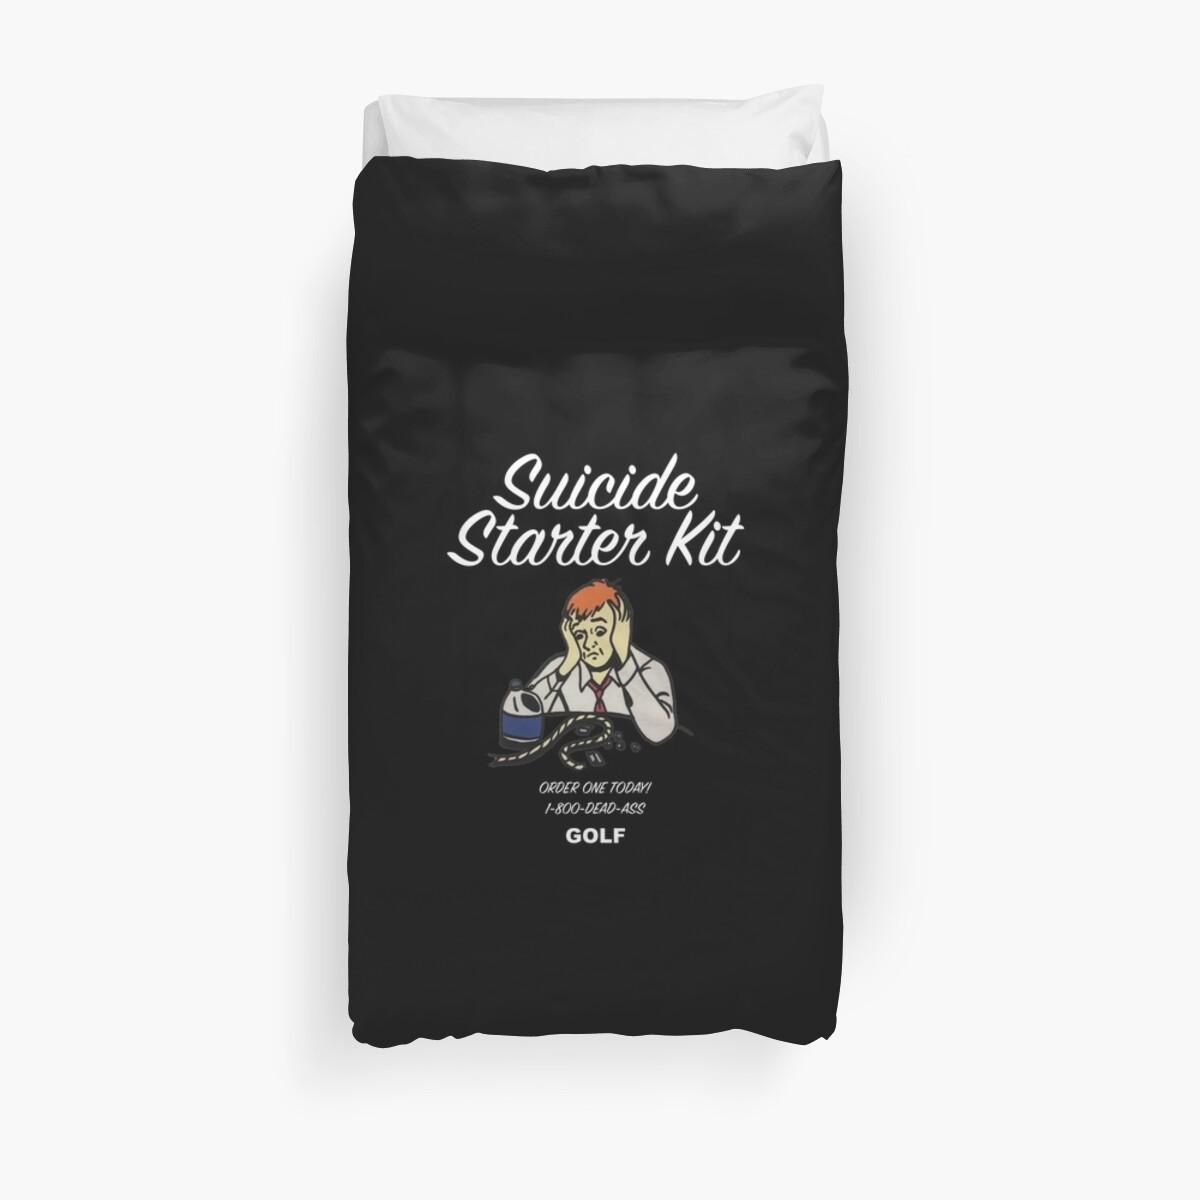 a7c62ce1072b GOLF Suicide Starter Kit